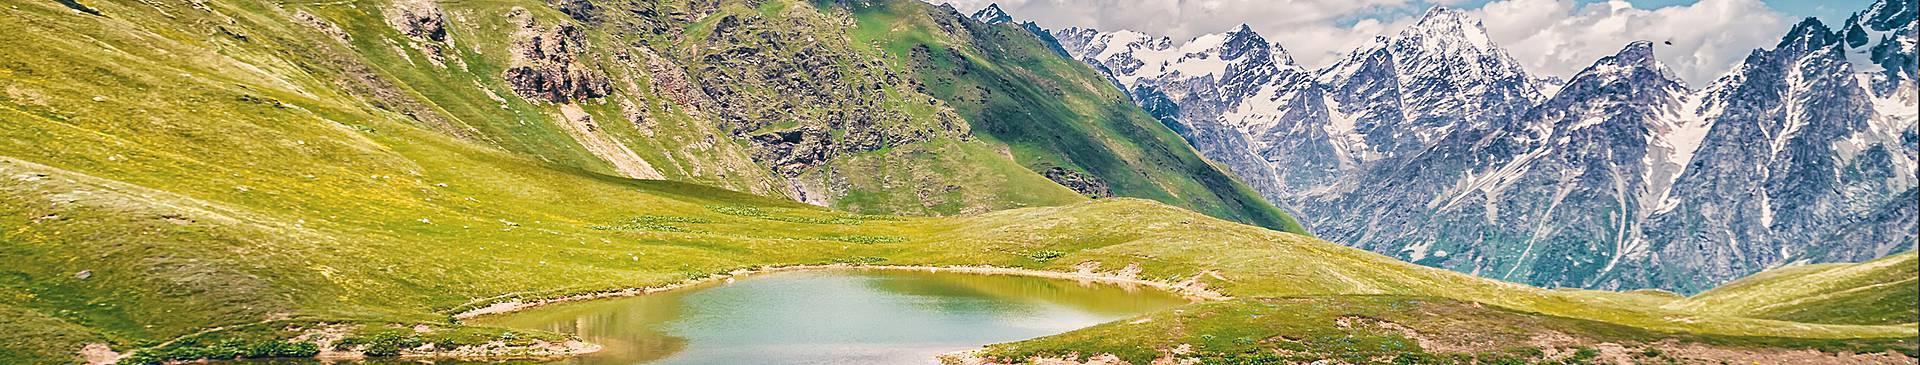 Naturreisen Georgien